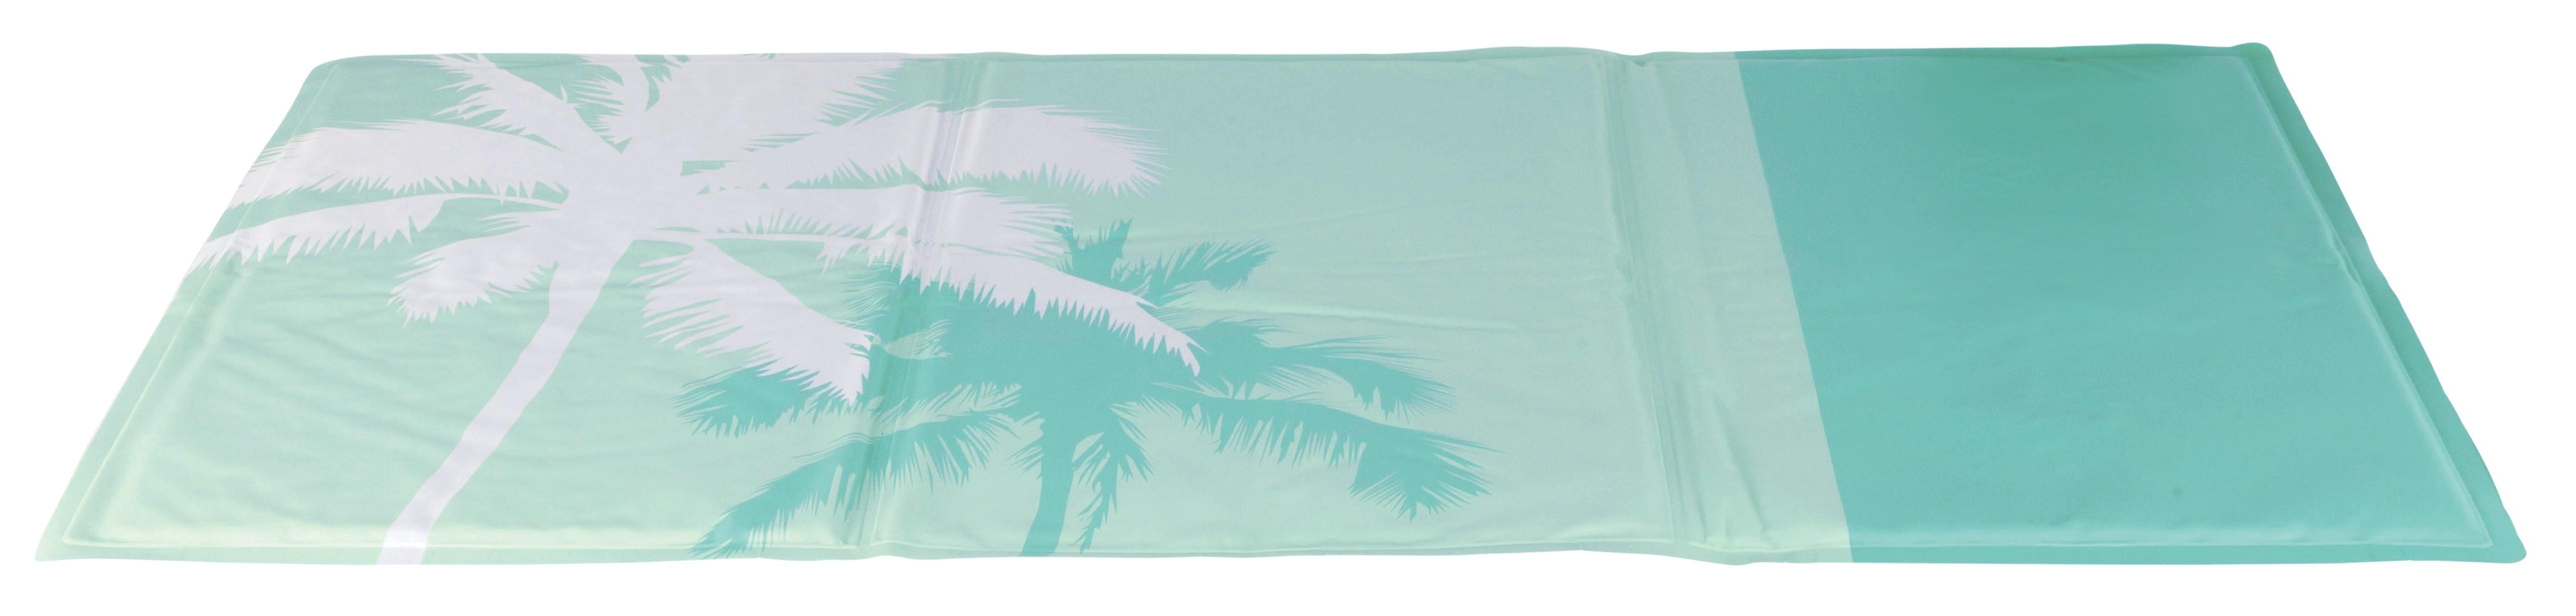 Trixie Cooling Mat 50 x 40 - MINT